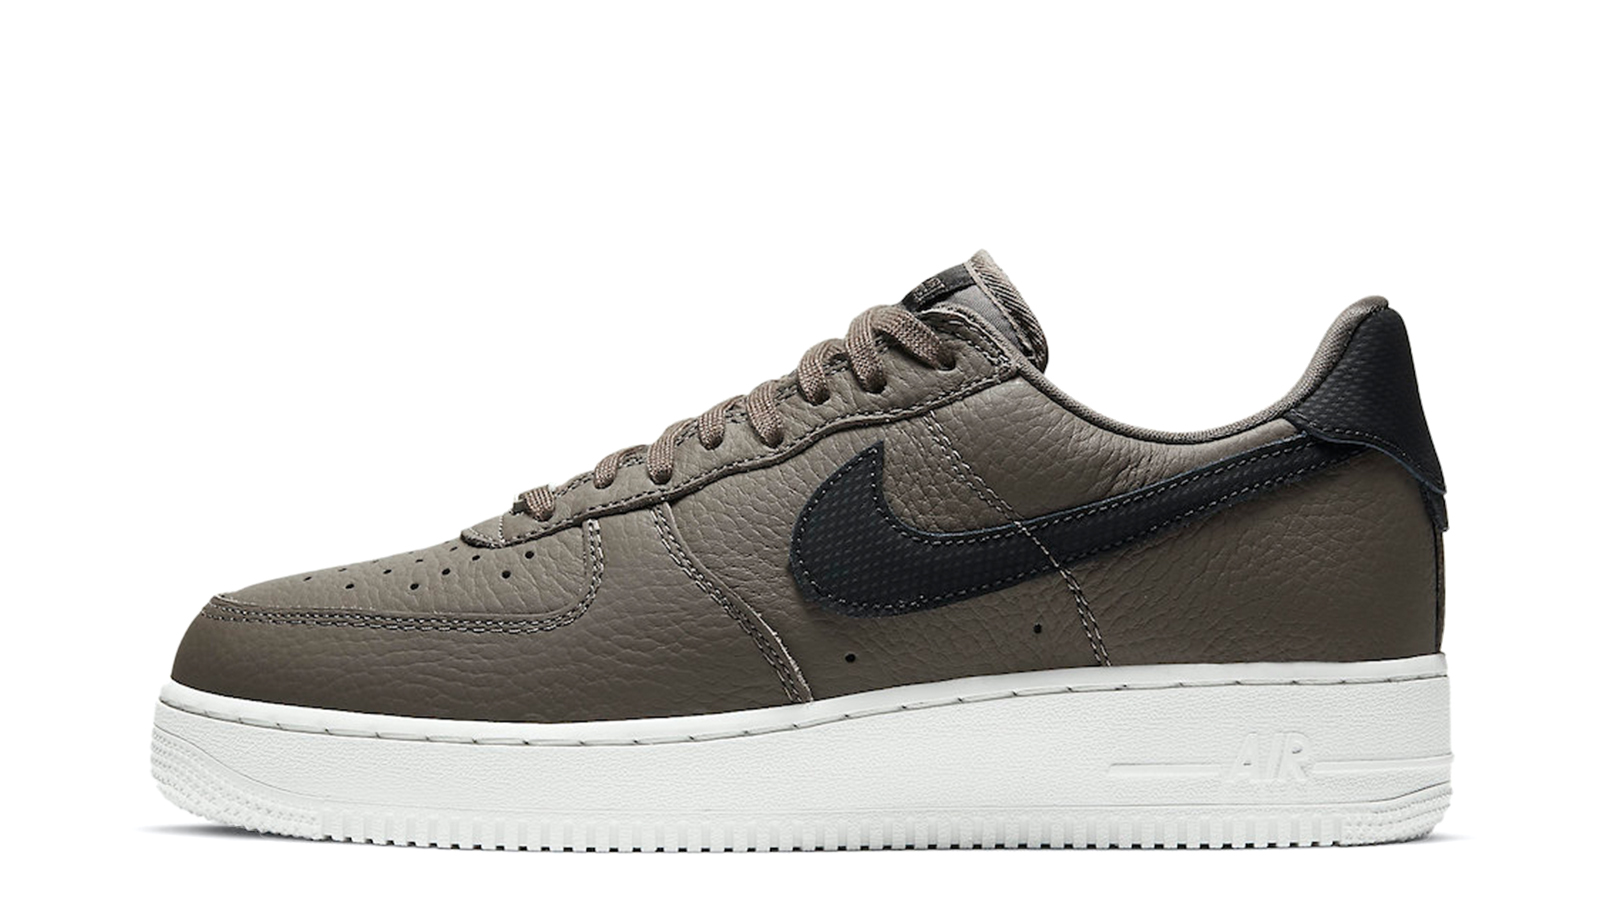 Nike Air Force 1 Craft Ridgerock CT2317-200